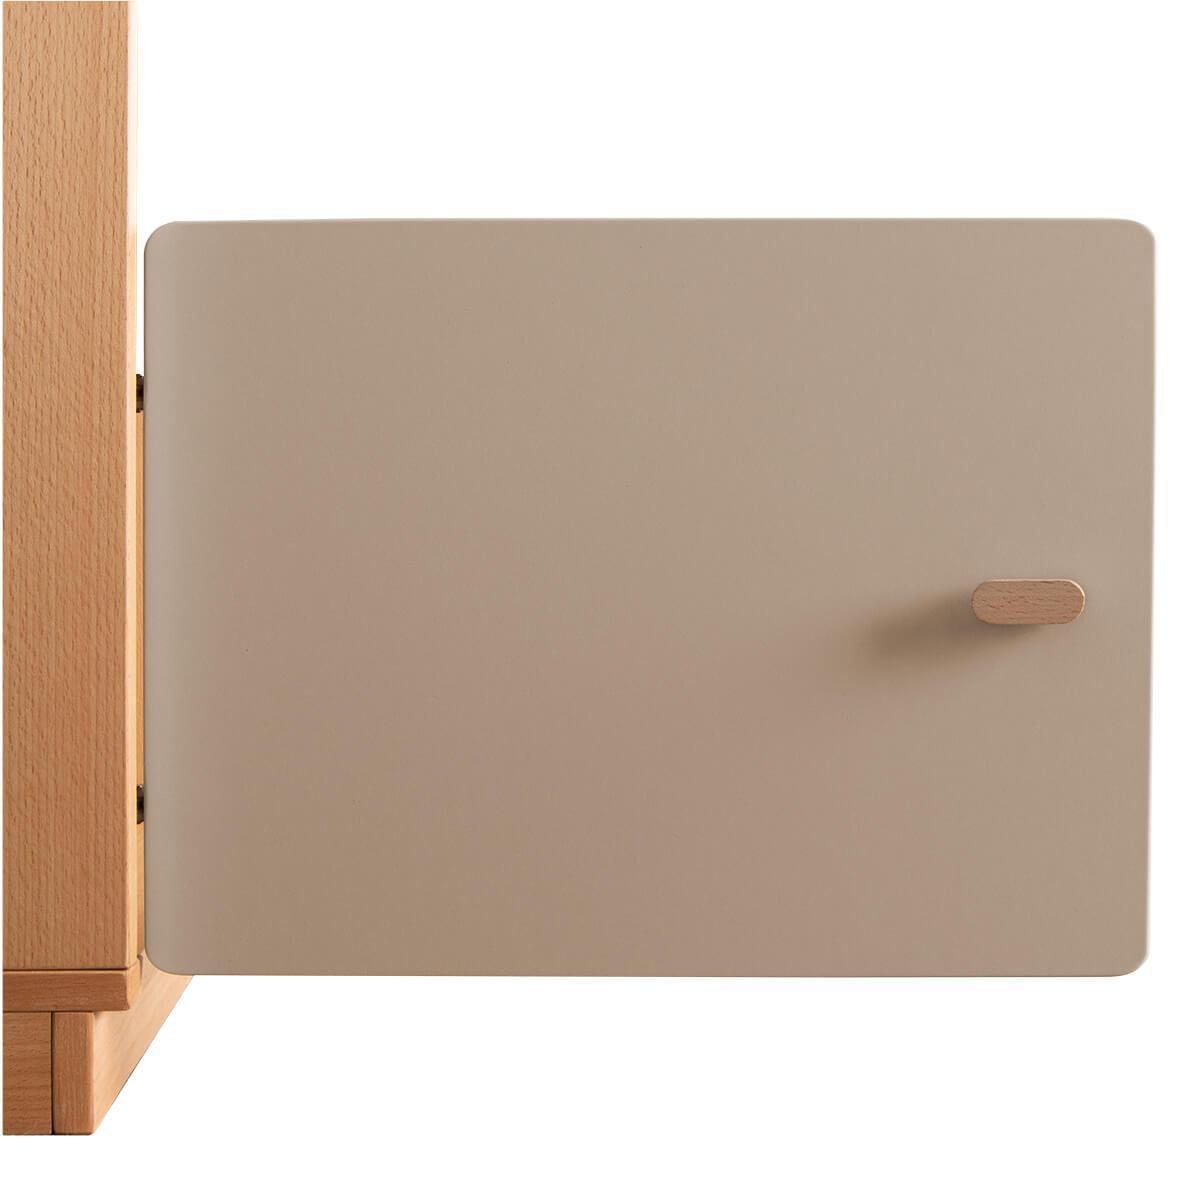 Schranktür 1/5 35cm-Griff DESTYLE Debreuyn  MDF hellgrau-lackiert